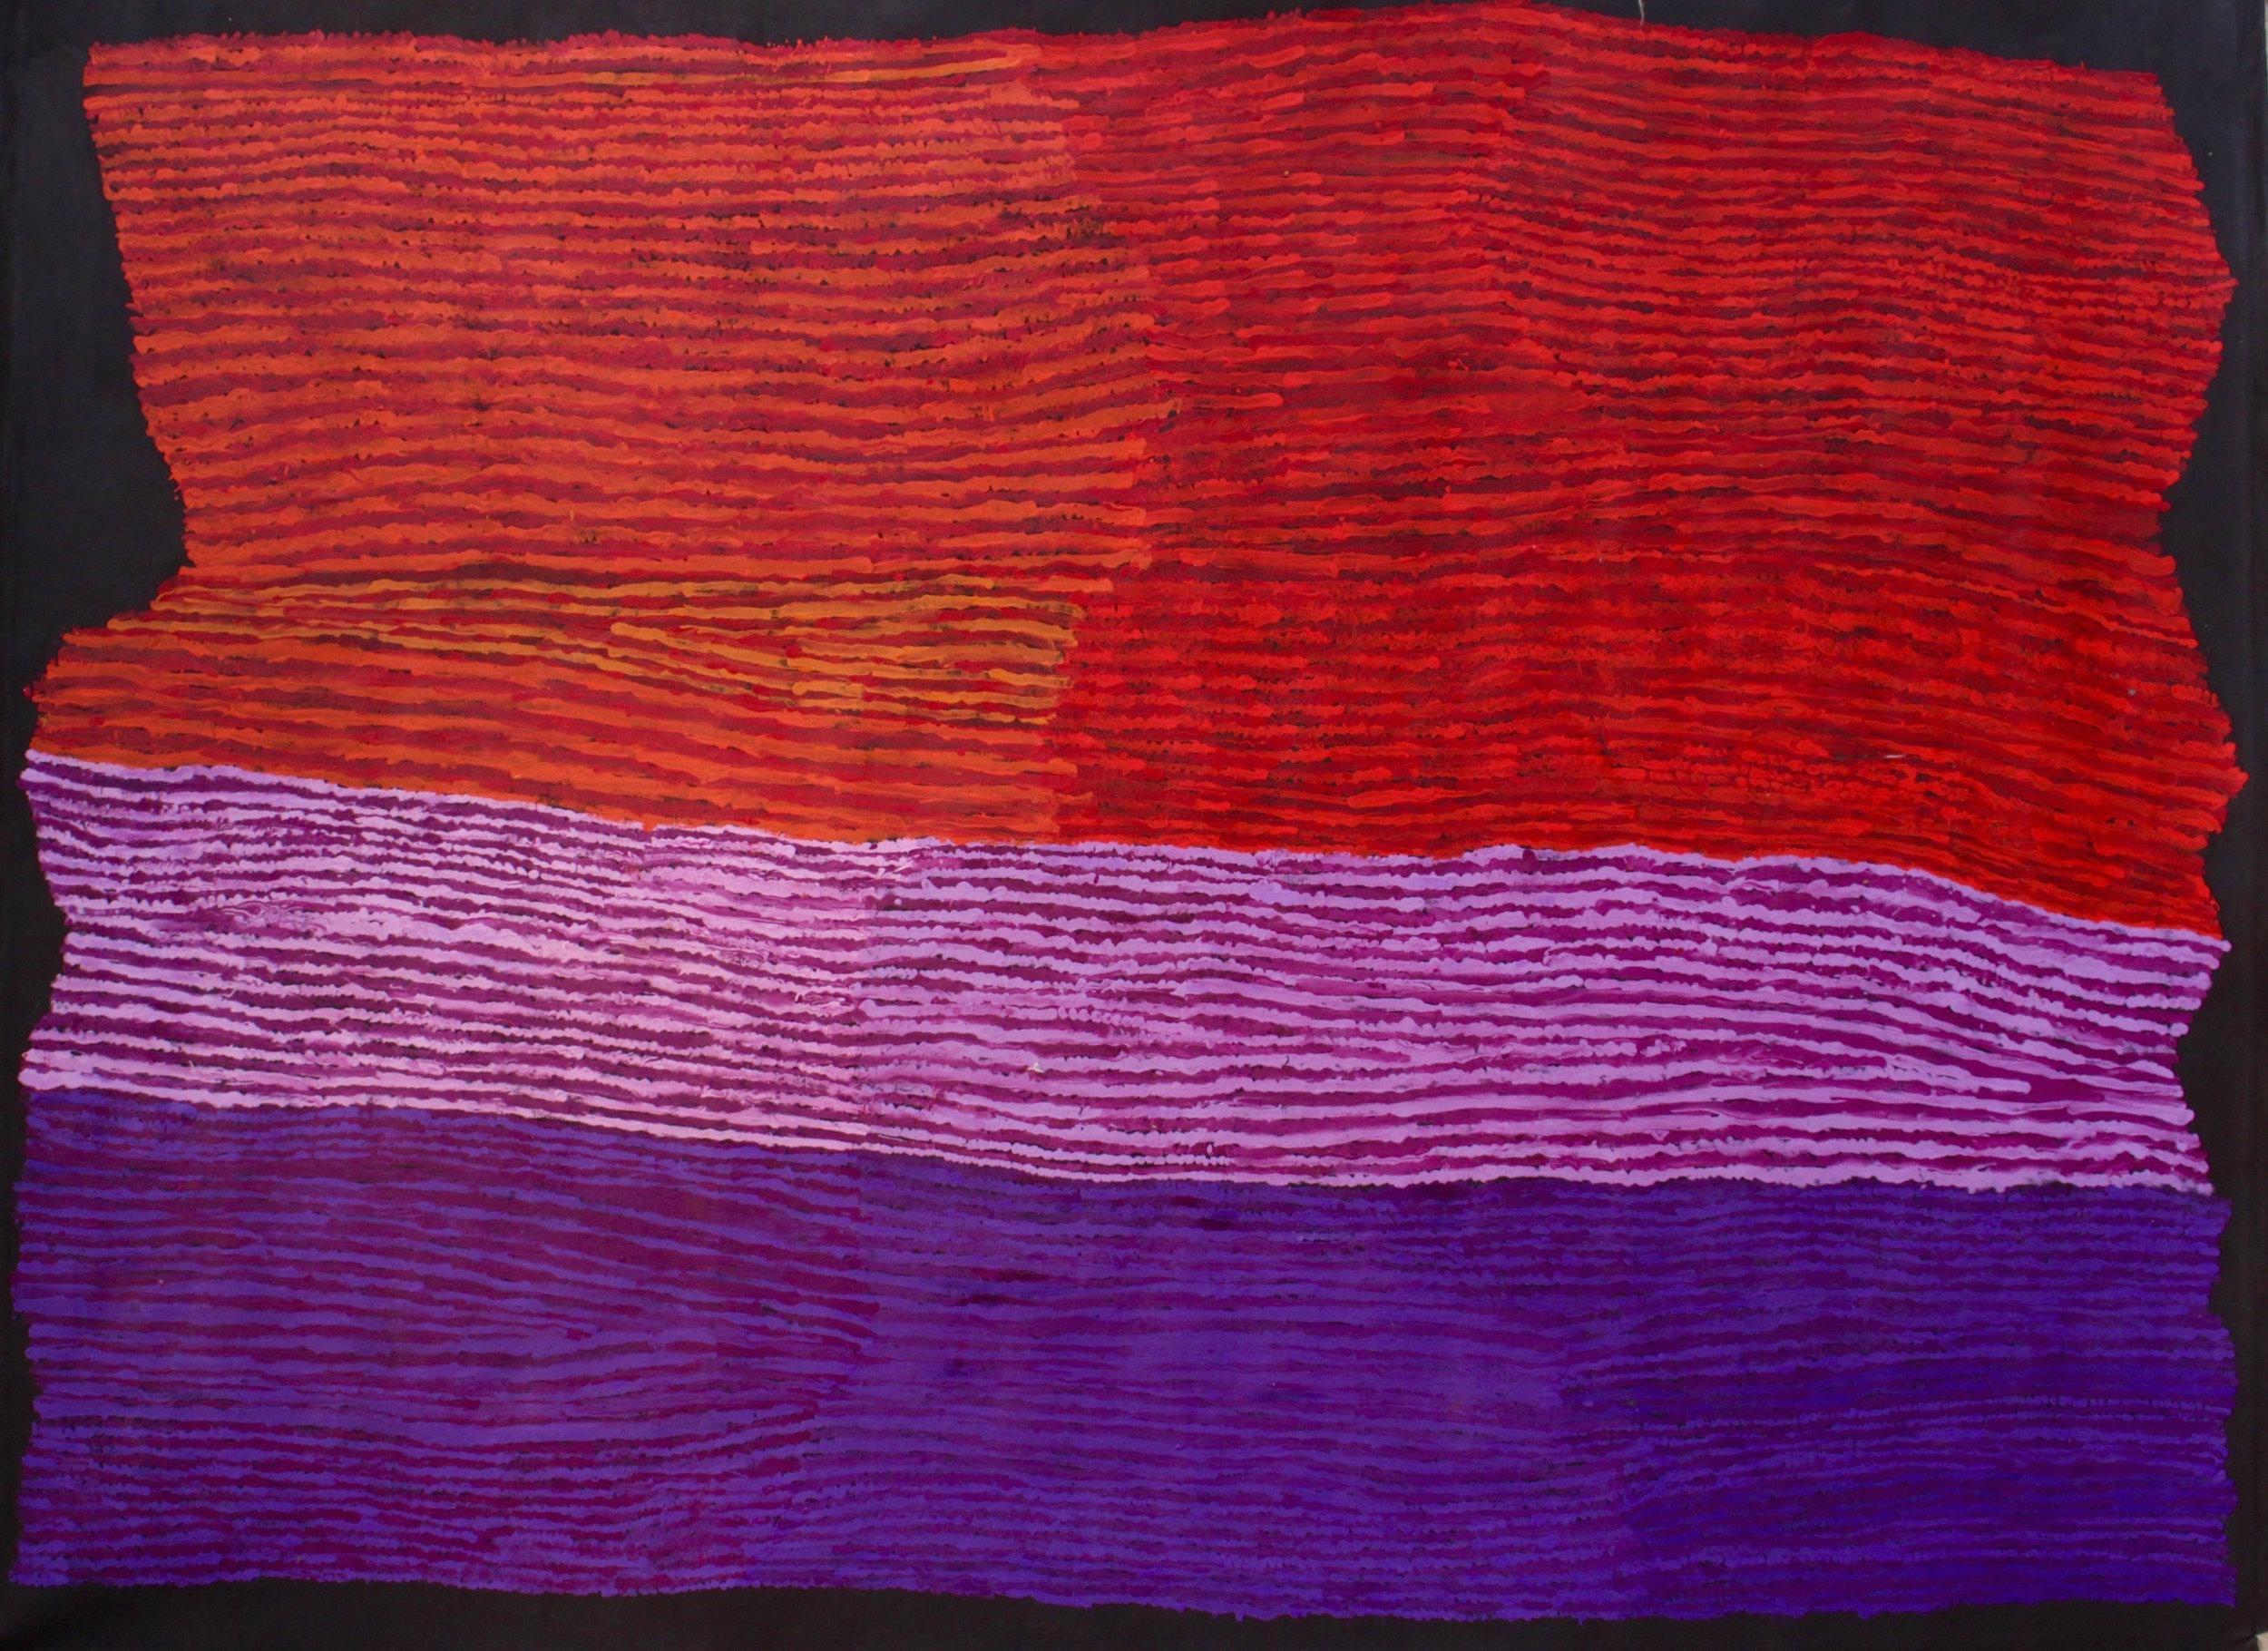 "KUNMANARA (RAY) KEN  Tali - Sand Dune  Acrylic on Belgian linen 1520 x 1980 mm (60 x 78"") Tjala Arts Catalog #392-16   EMAIL INQUIRY"